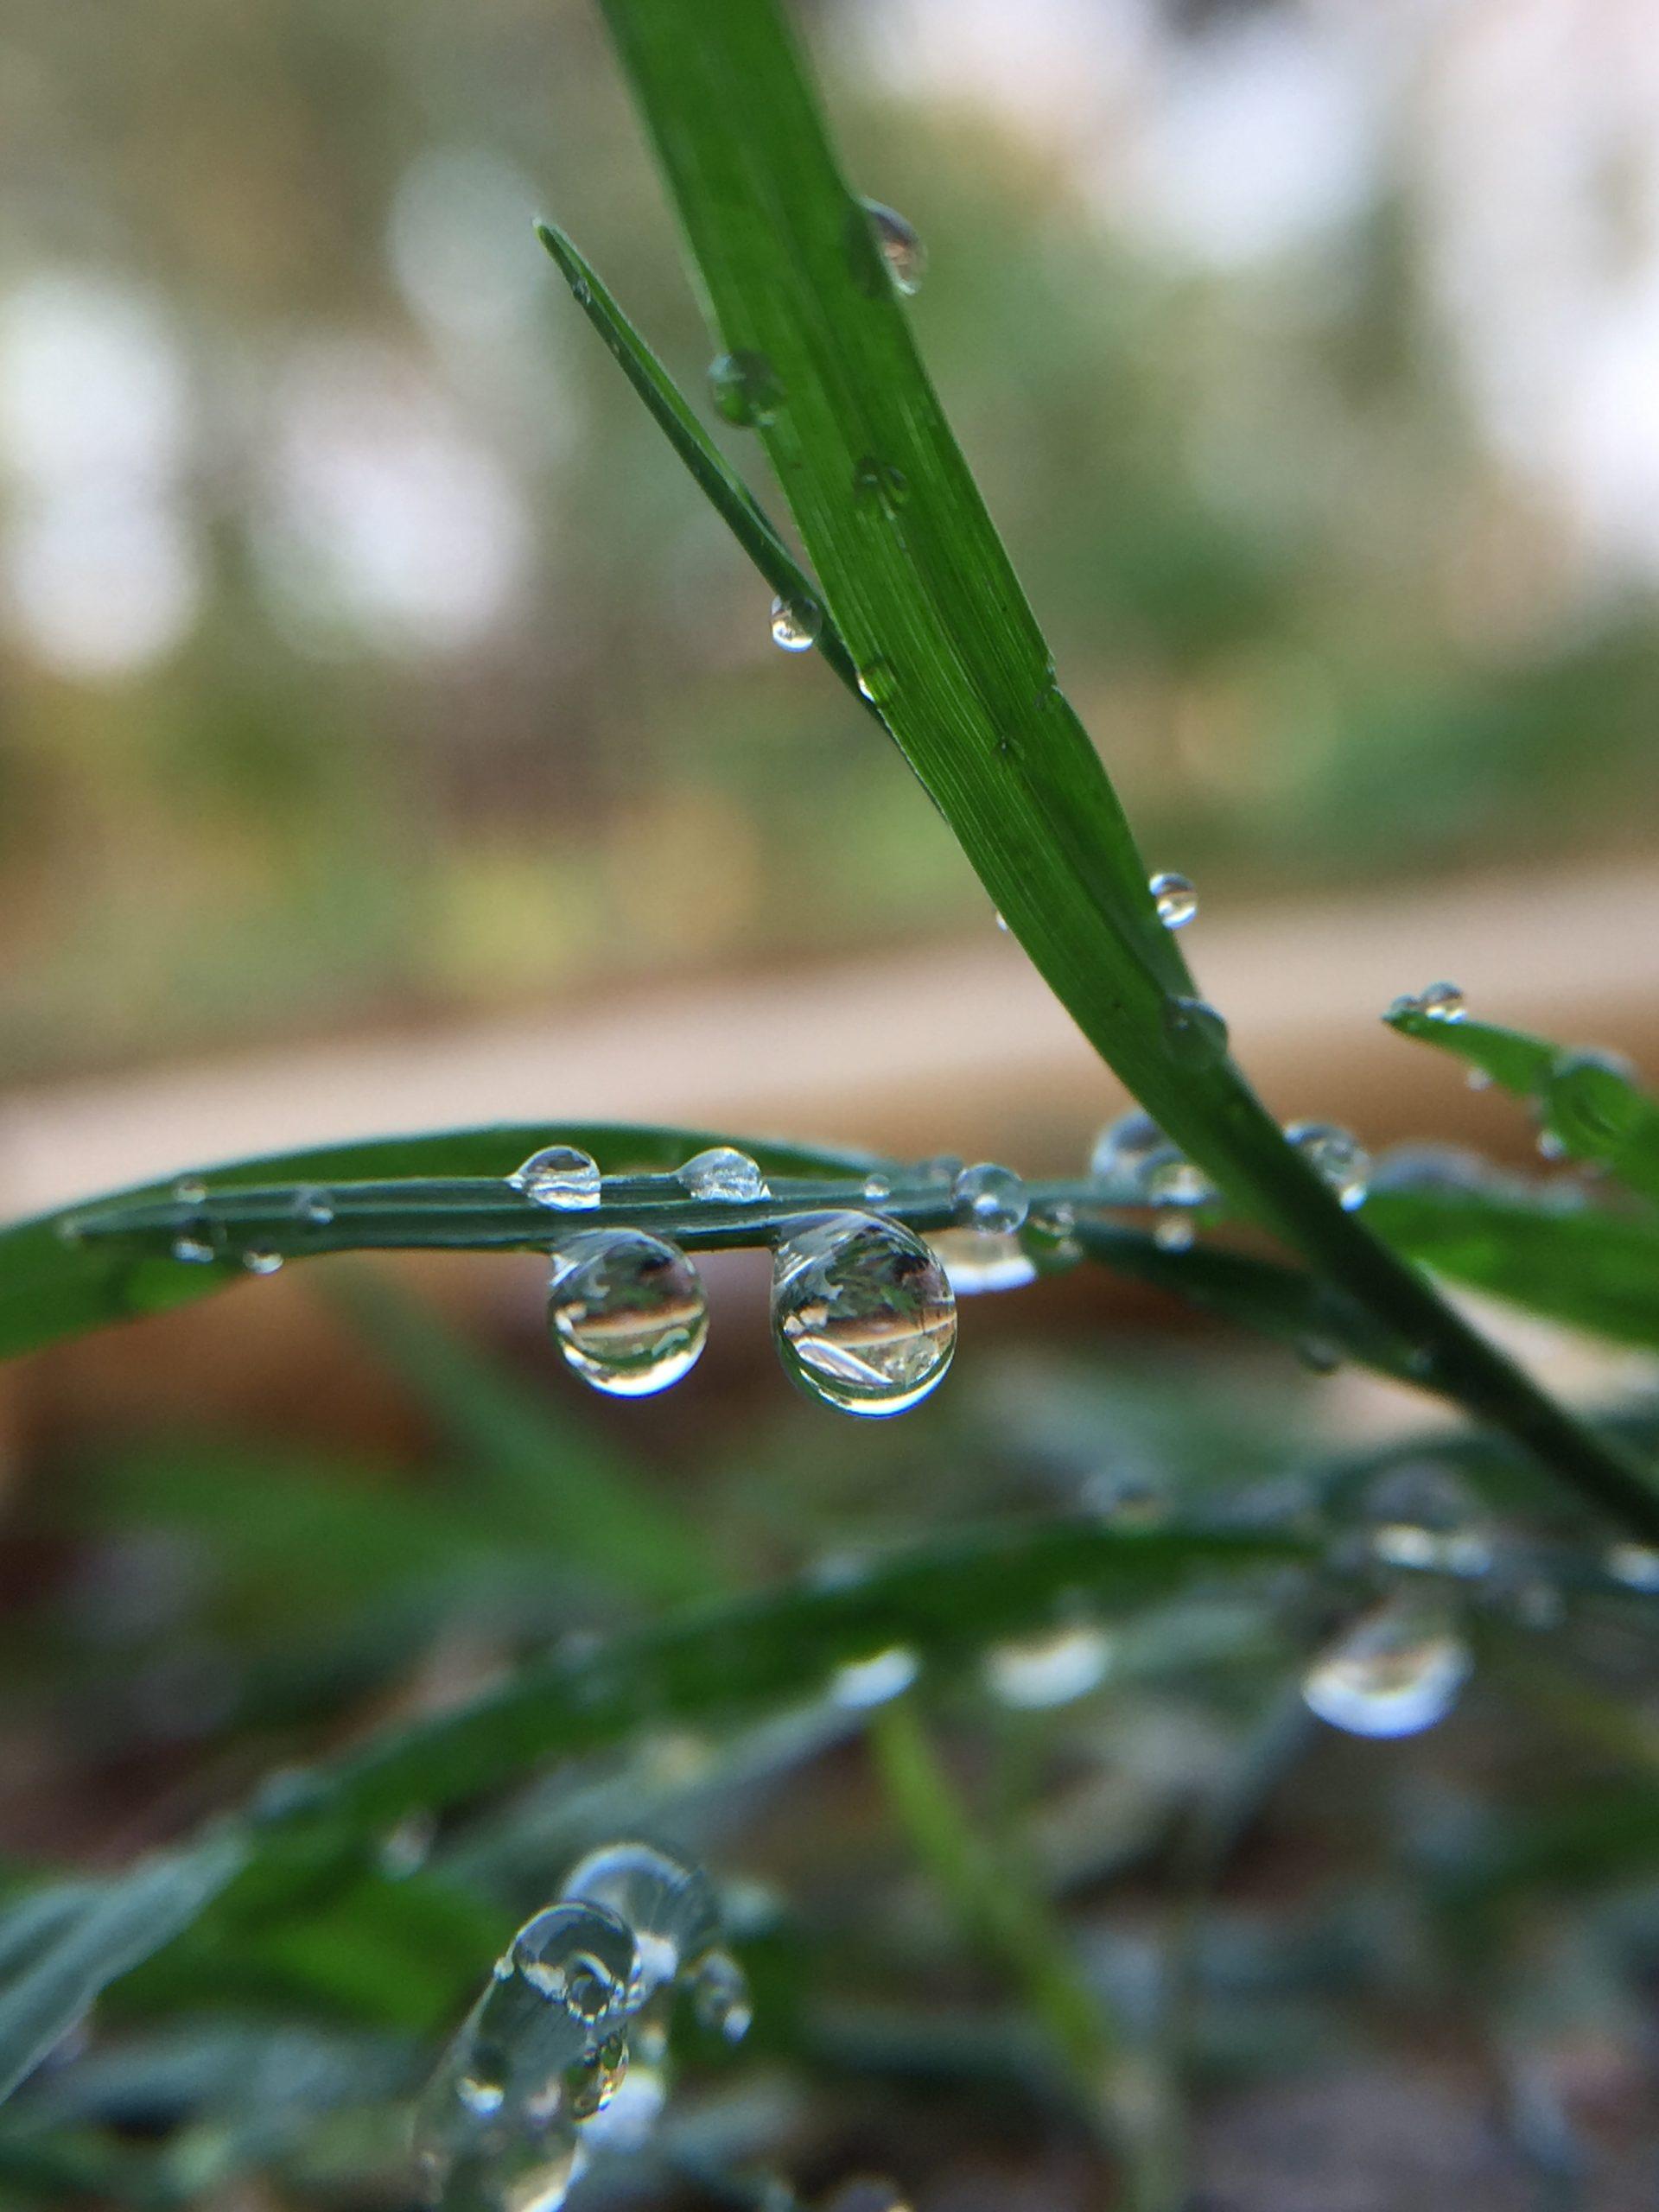 Drops on plant leaf